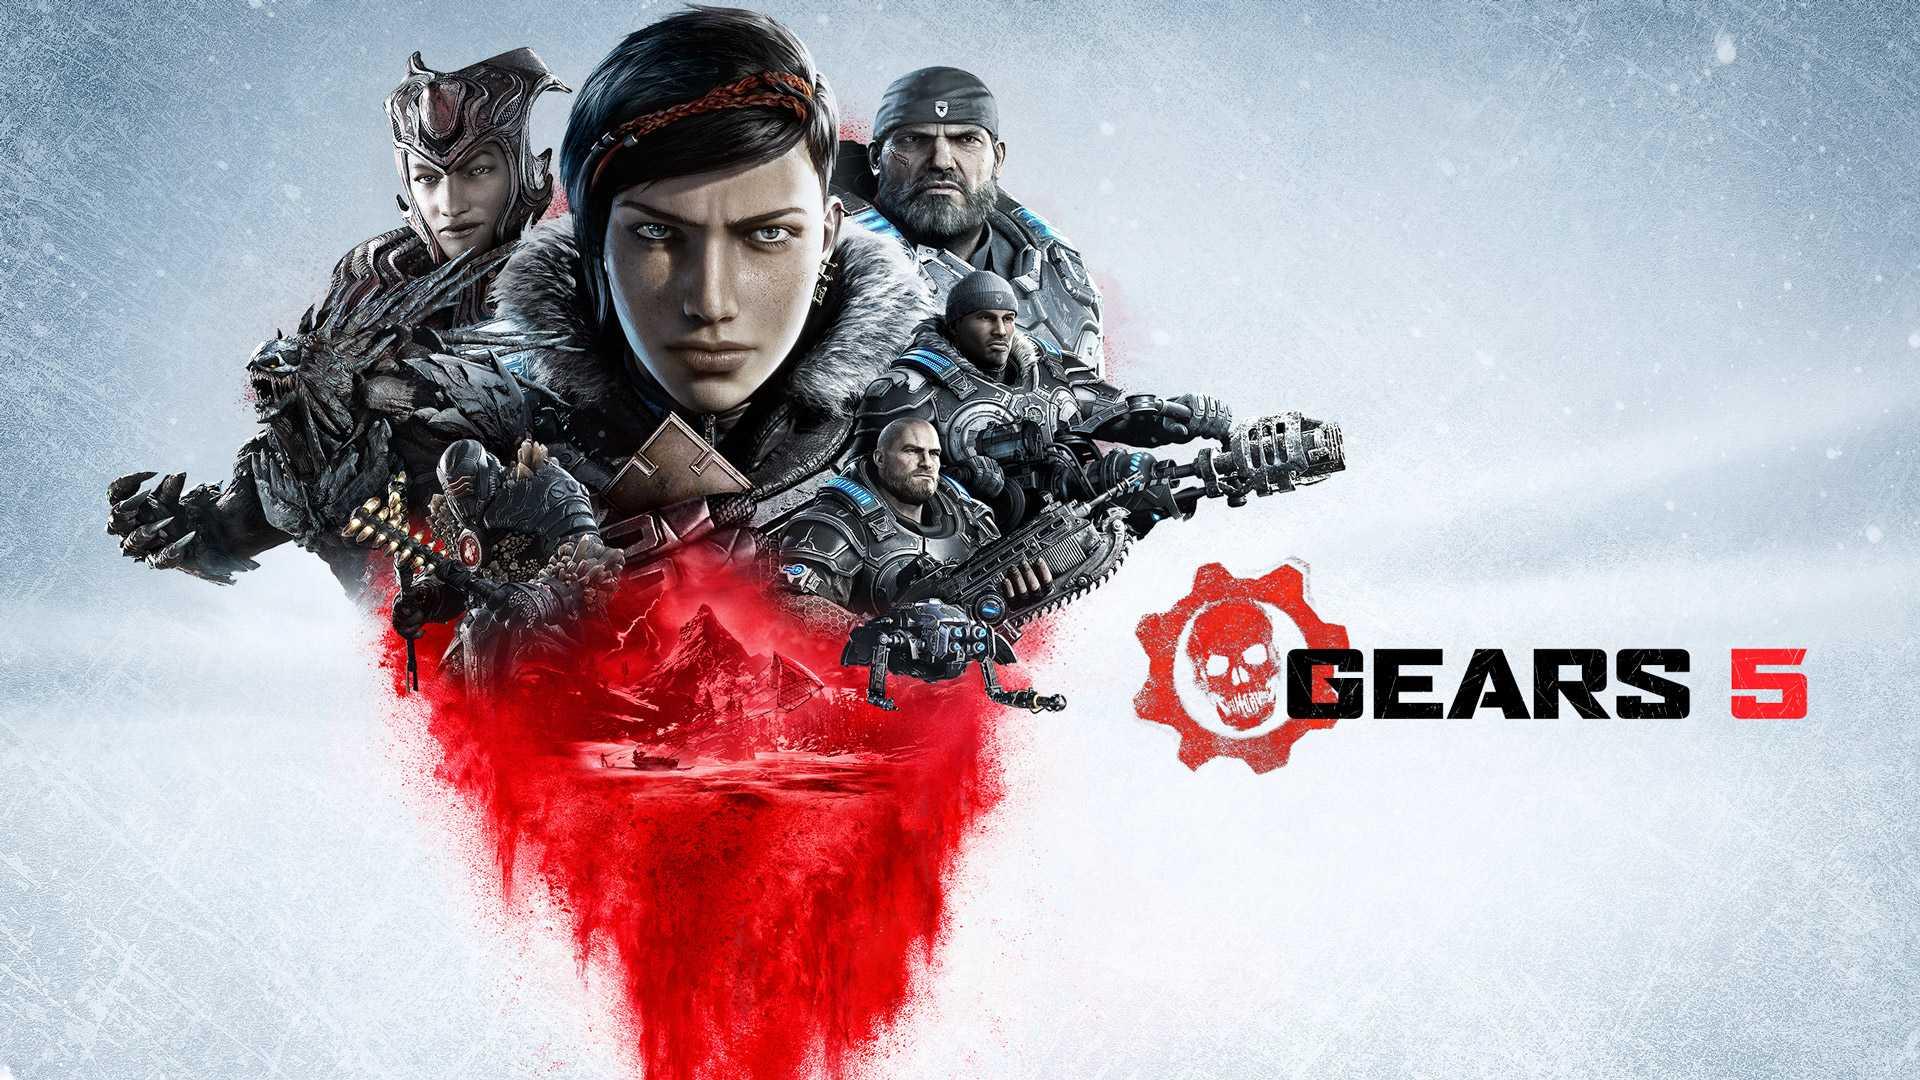 Гайд: Как переключать персонажей в Gears 5